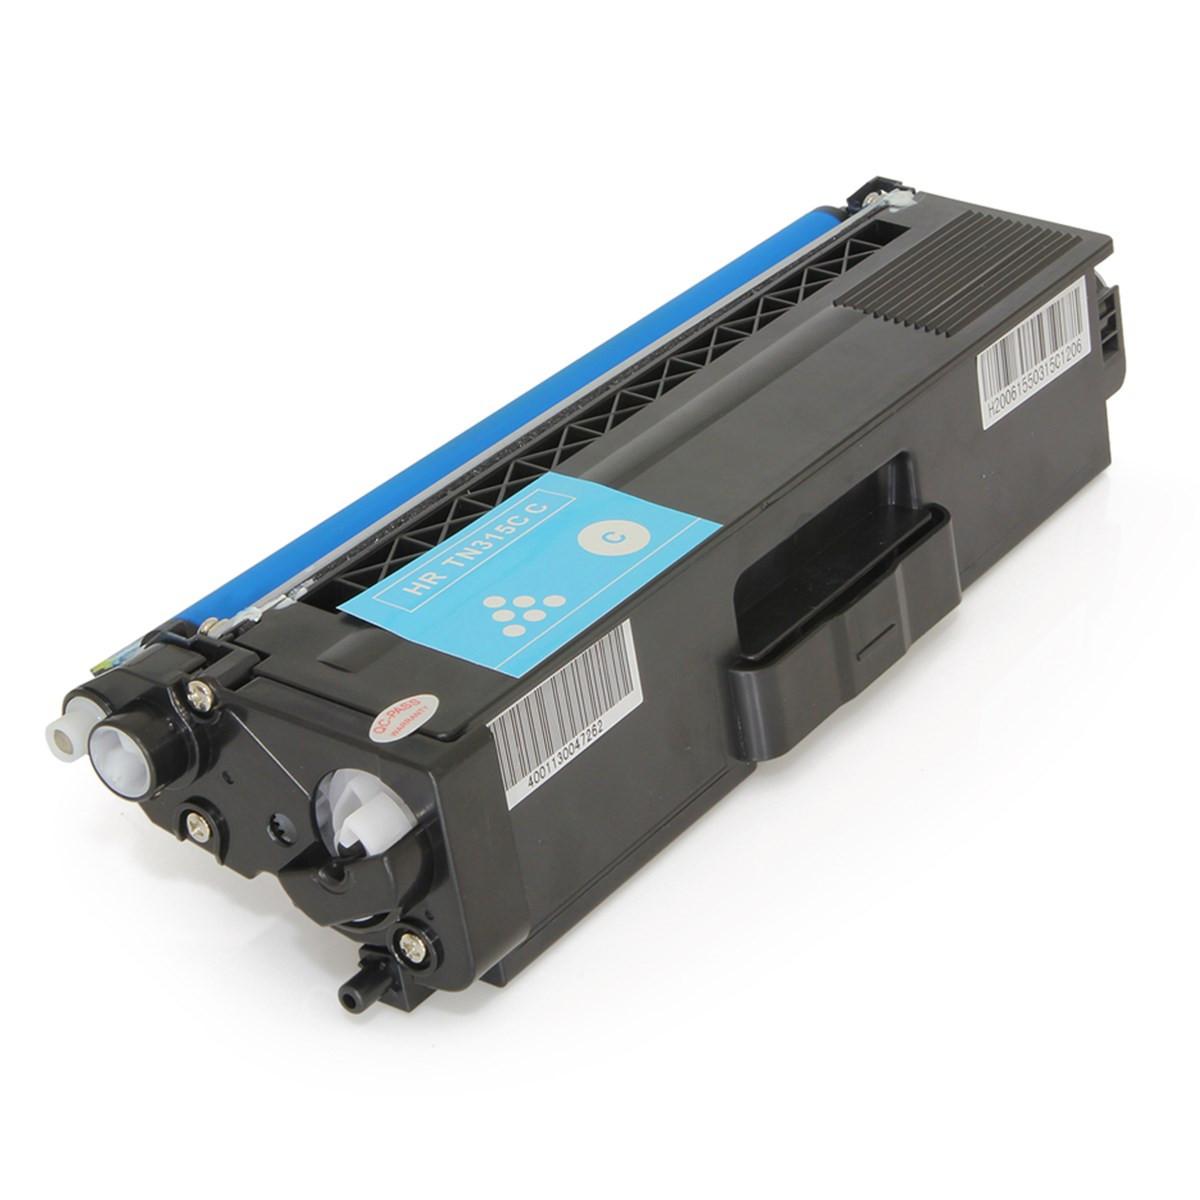 Toner Compatível com Brother TN310 TN310C Ciano | HL4150CDN MFC9560CDW HL4570CDW | Premium 1.5k